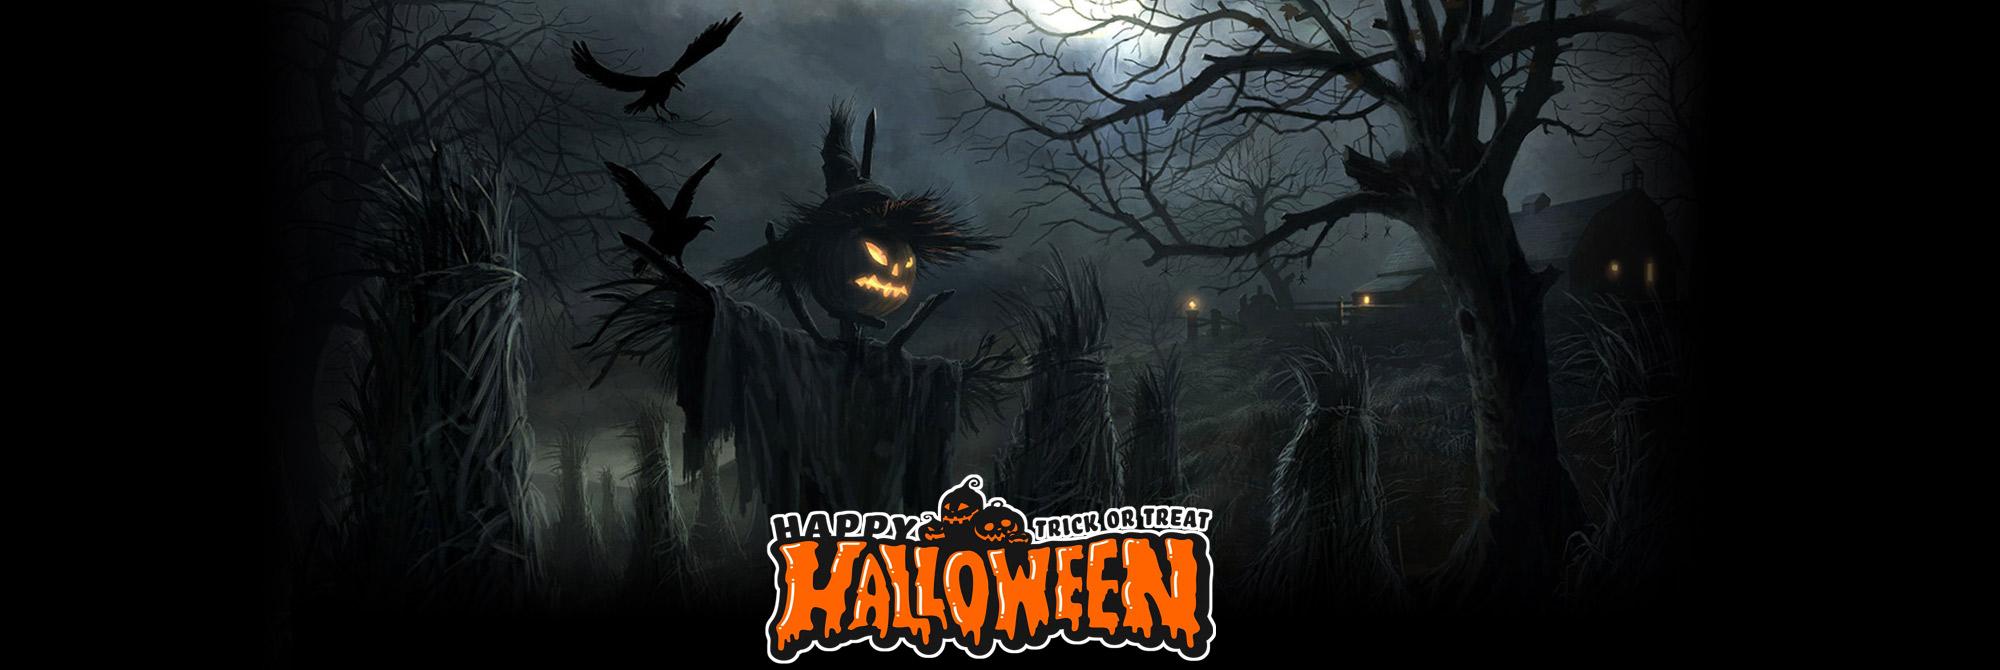 halloween_slider06